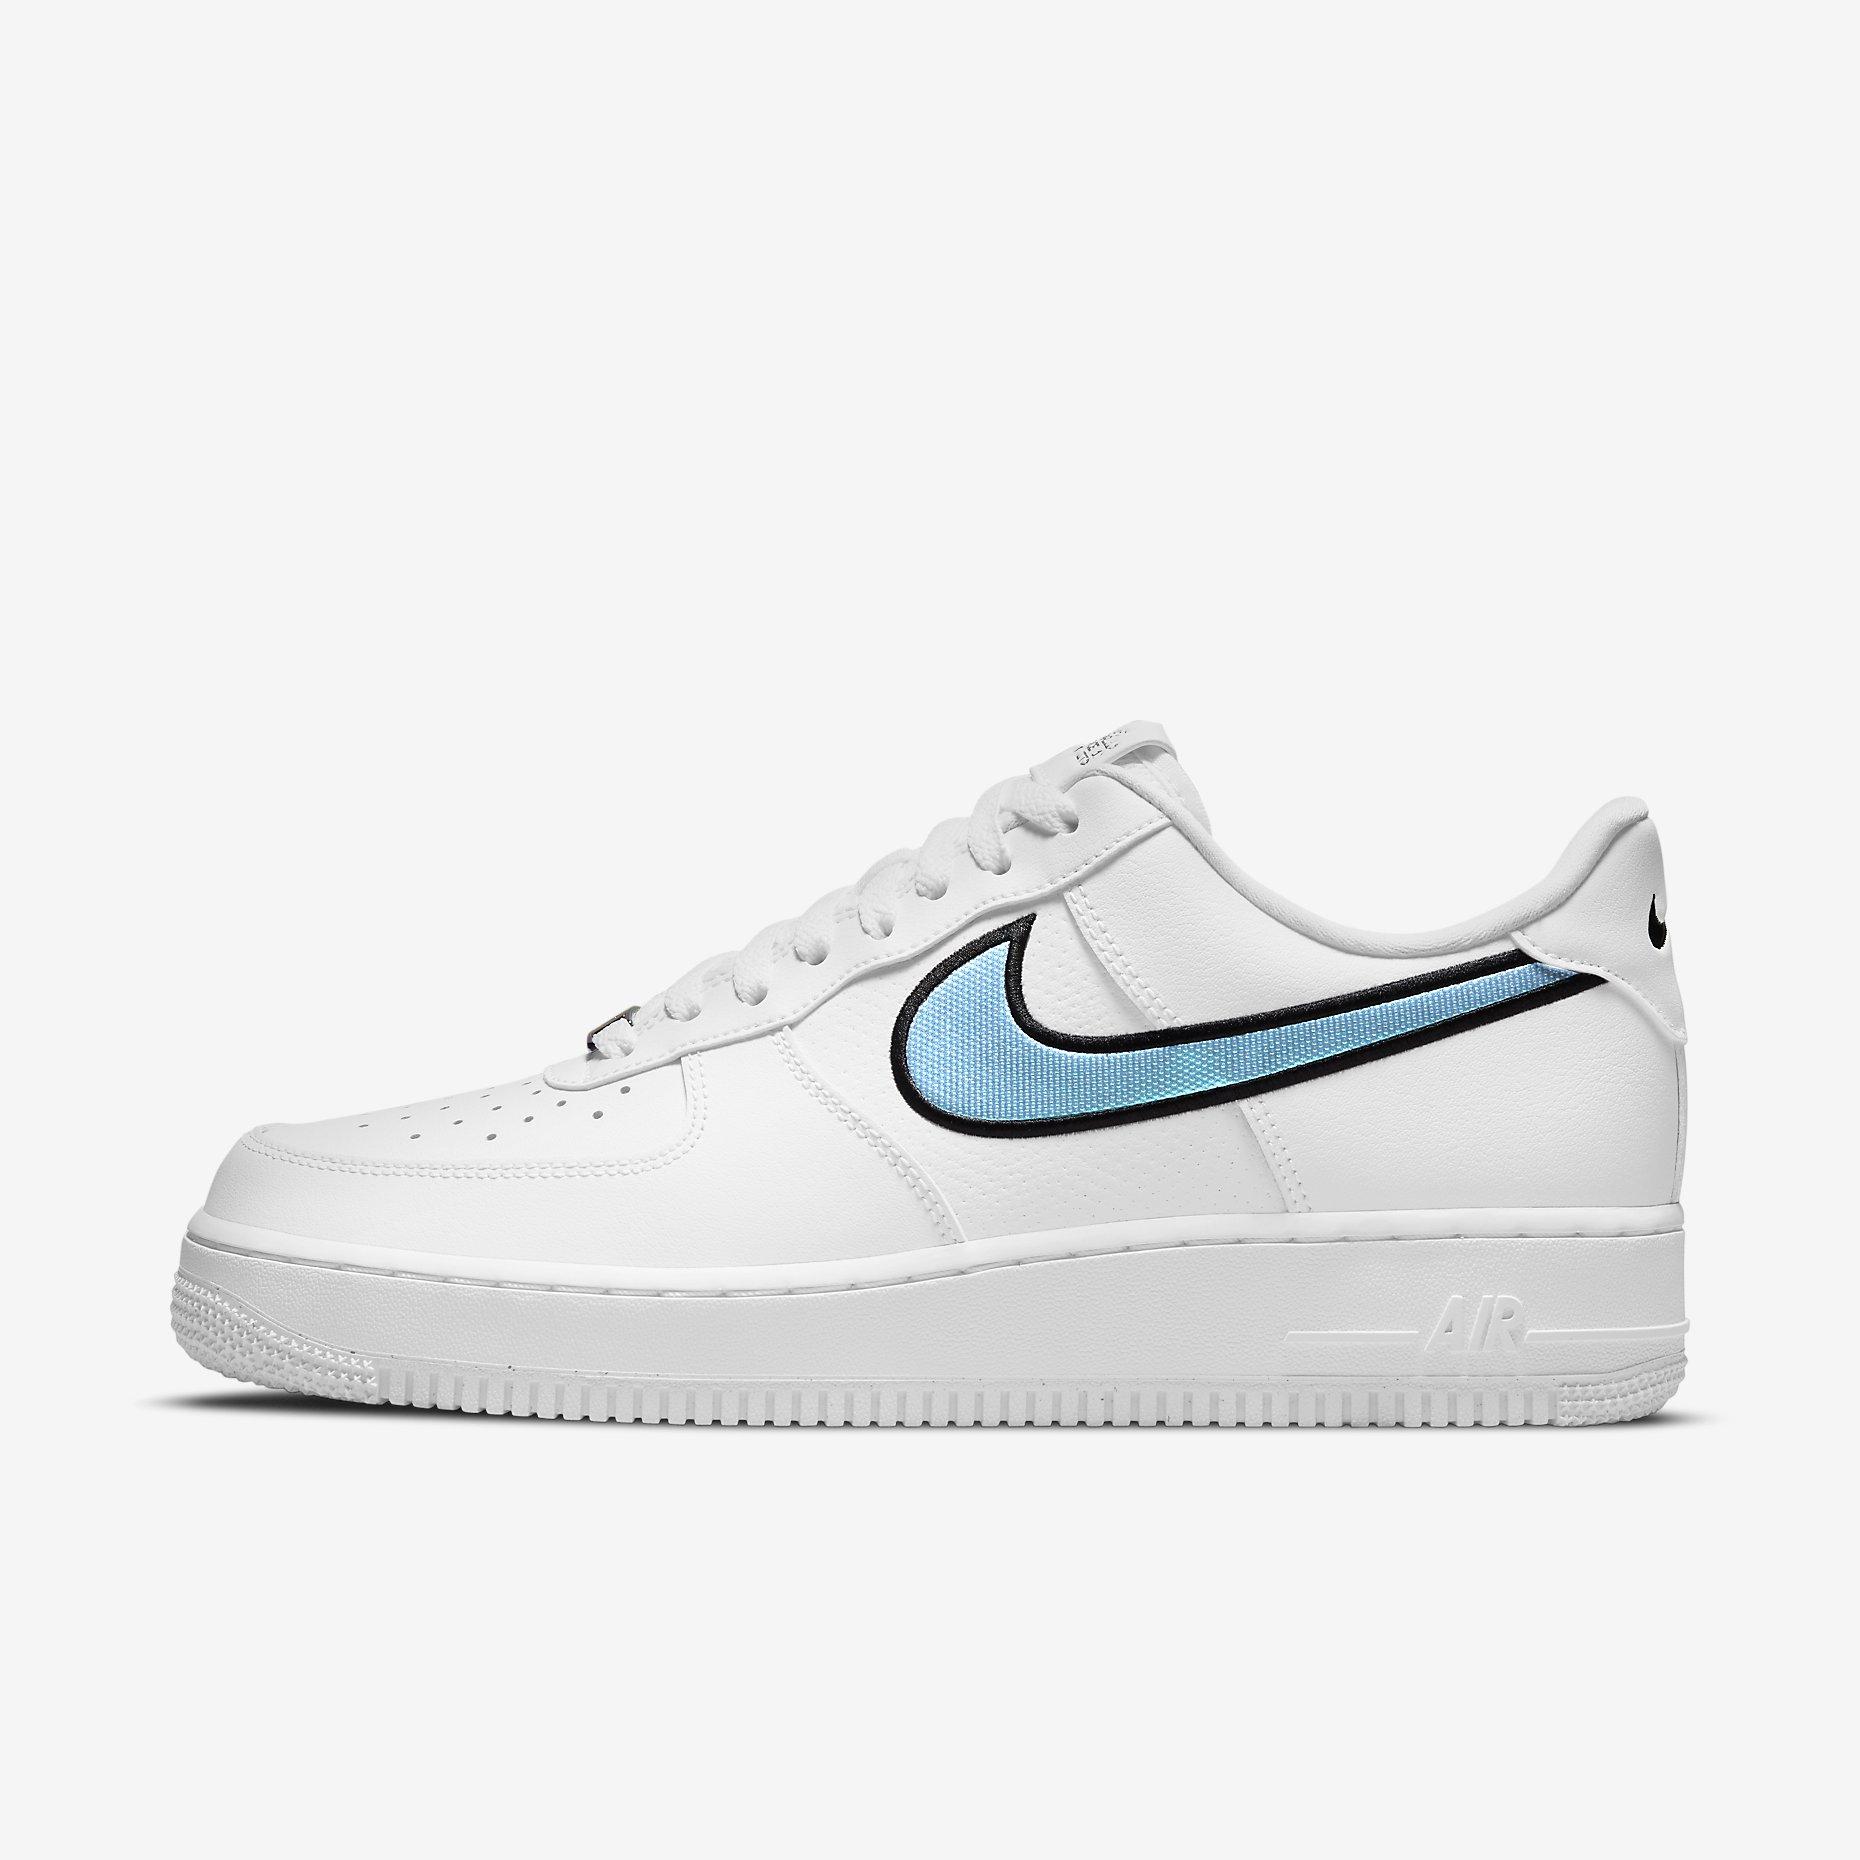 Nike Air Force 1 'Iridescent Swoosh'